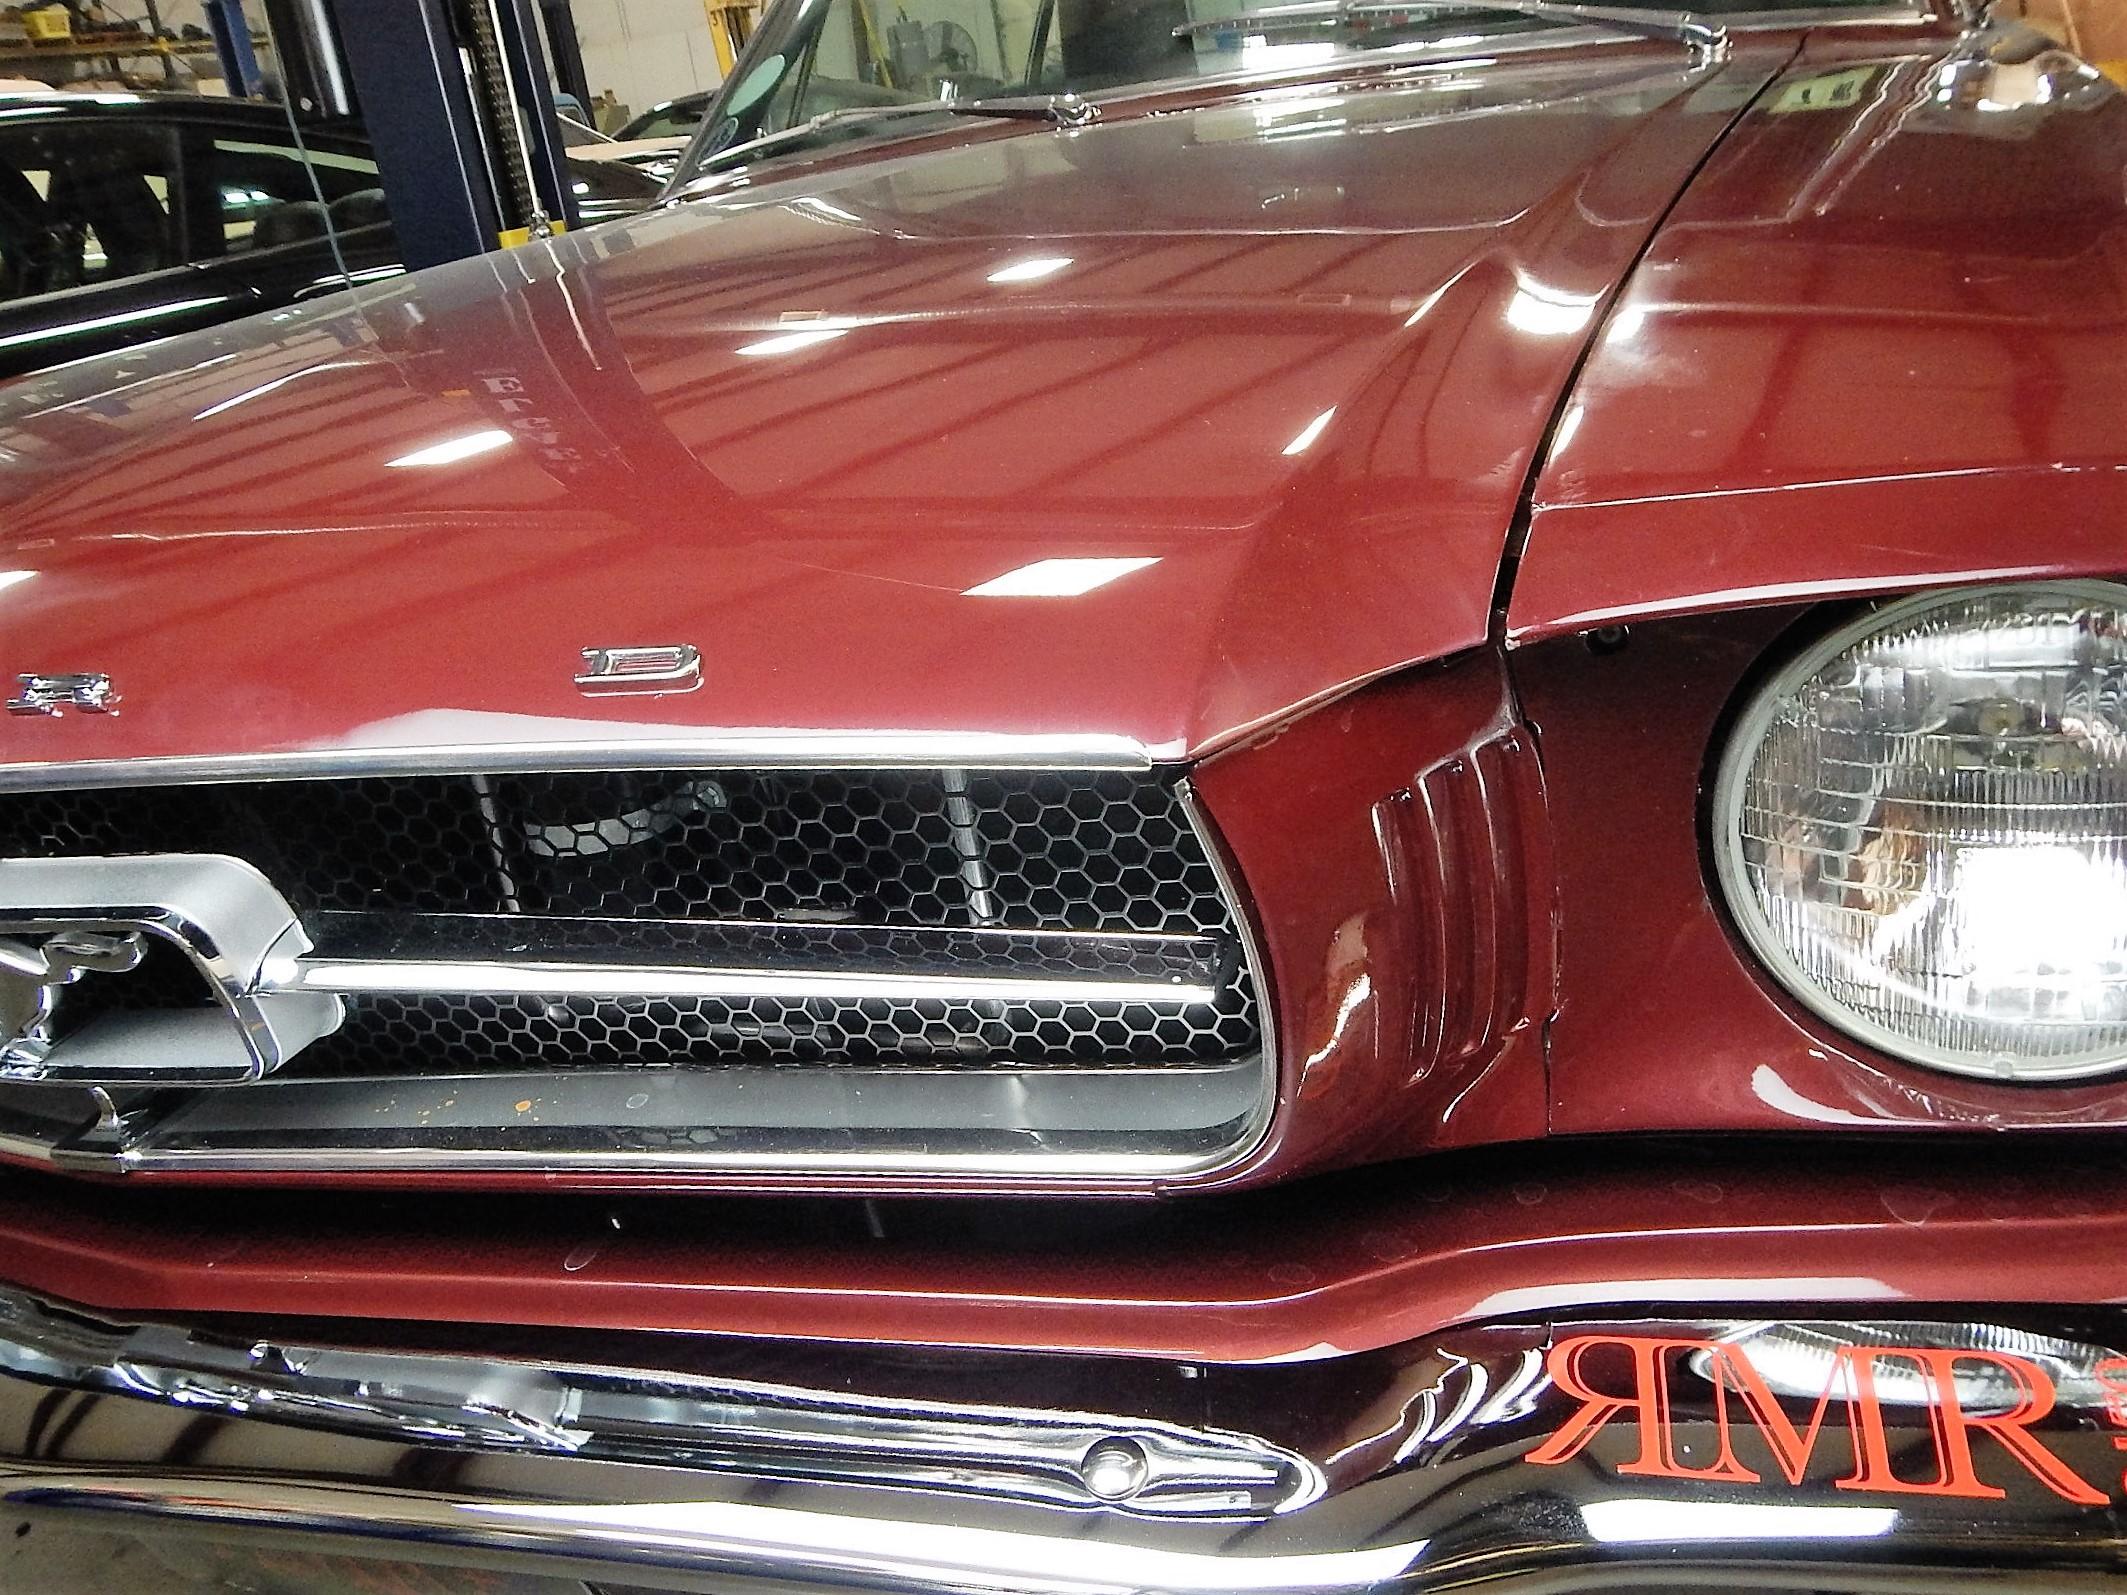 1965 Mustang Paul  010.jpg